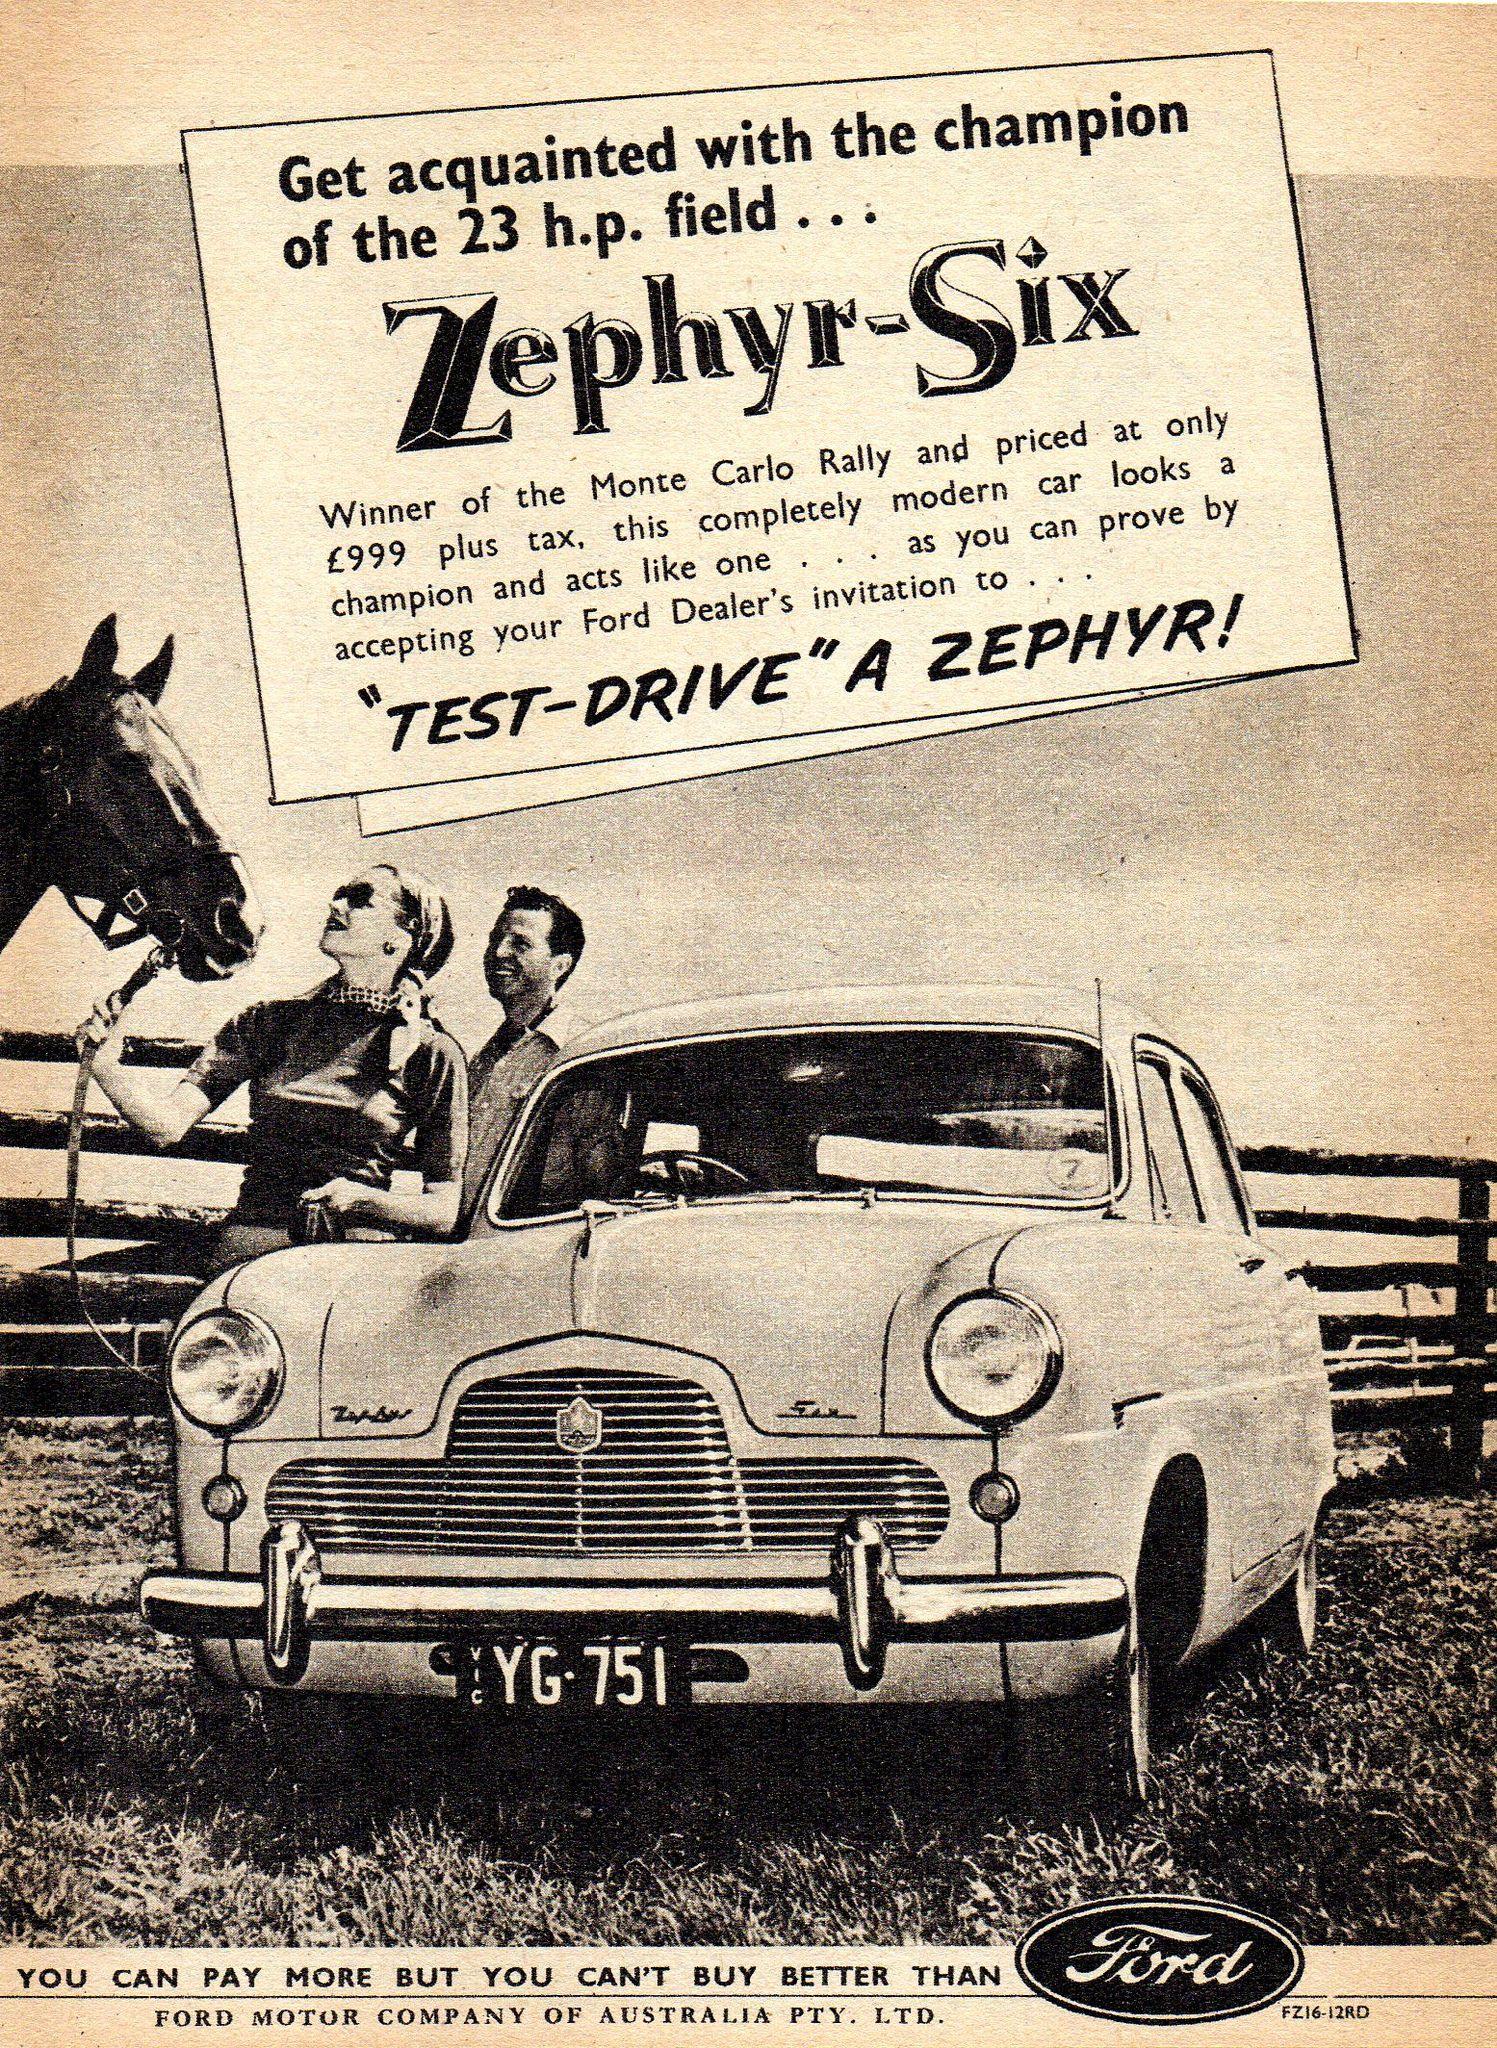 1954 Ford Zephyr Six Mark I Aussie Advertsement Ford Zephyr